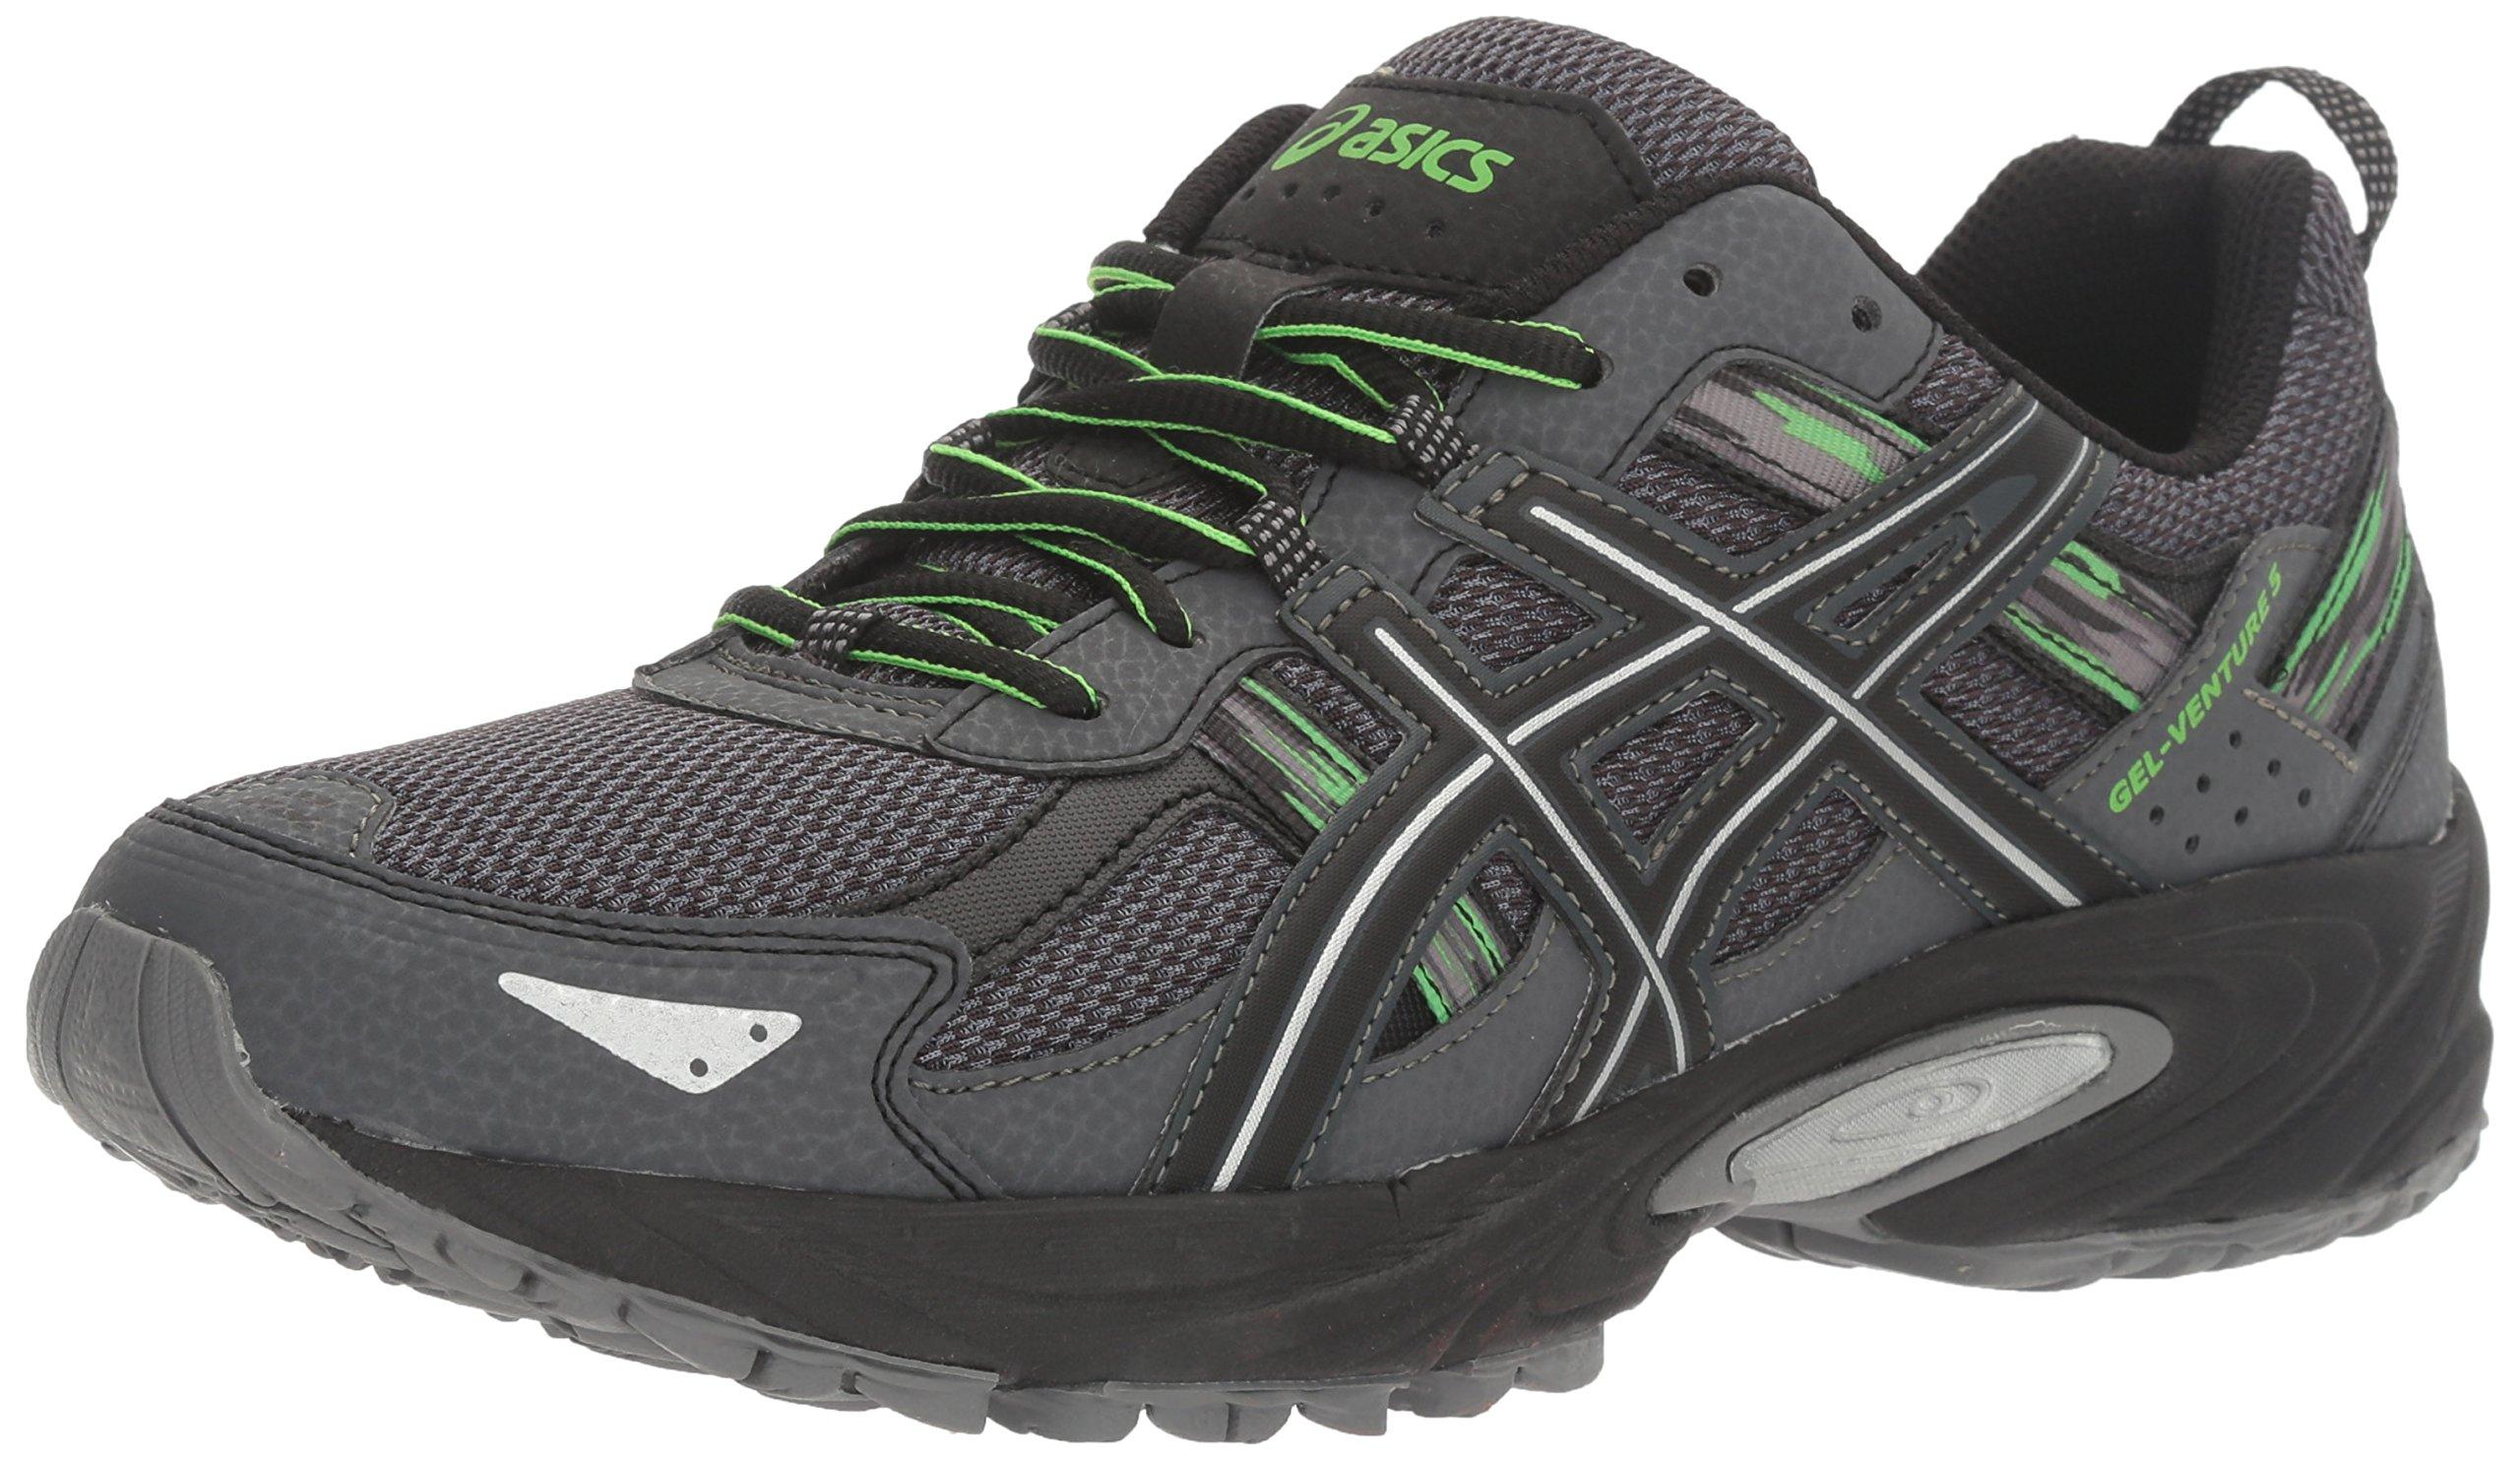 ASICS Men's Gel-Venture 5 Trail Runner, Carbon/Silver/Green Gecko, 8 M US by ASICS (Image #1)